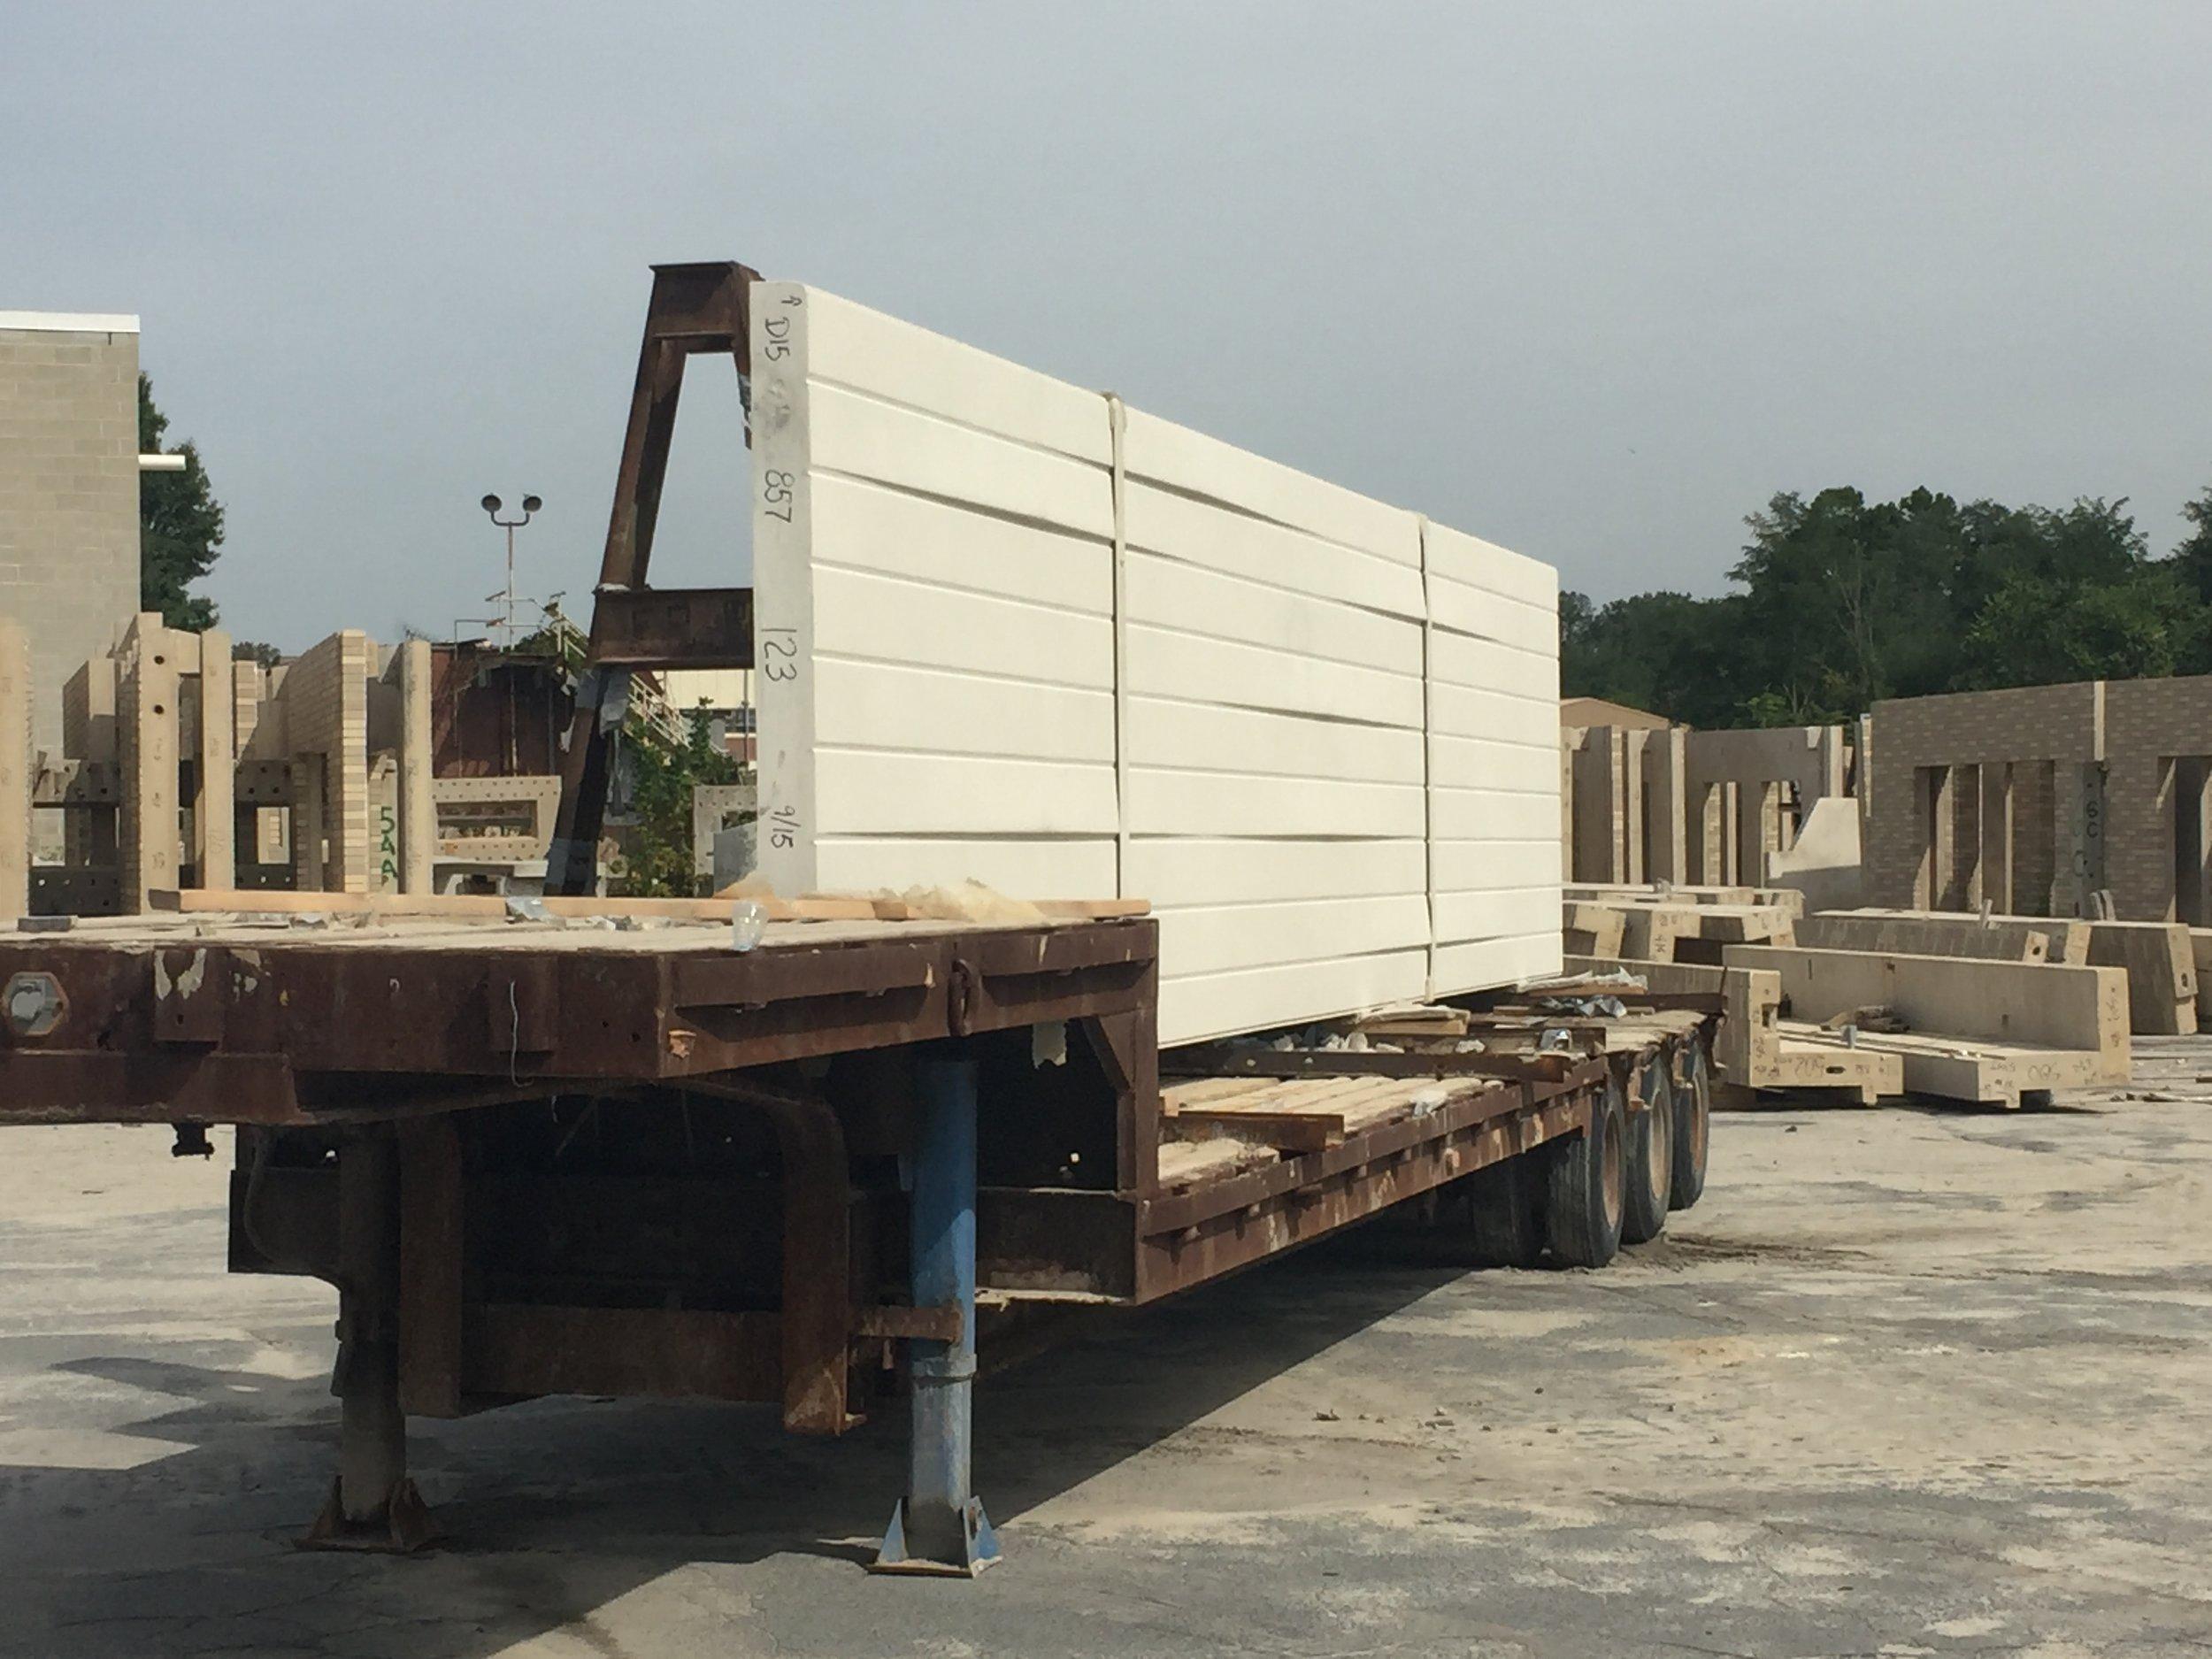 Precast panel on truck prepared for delivery.